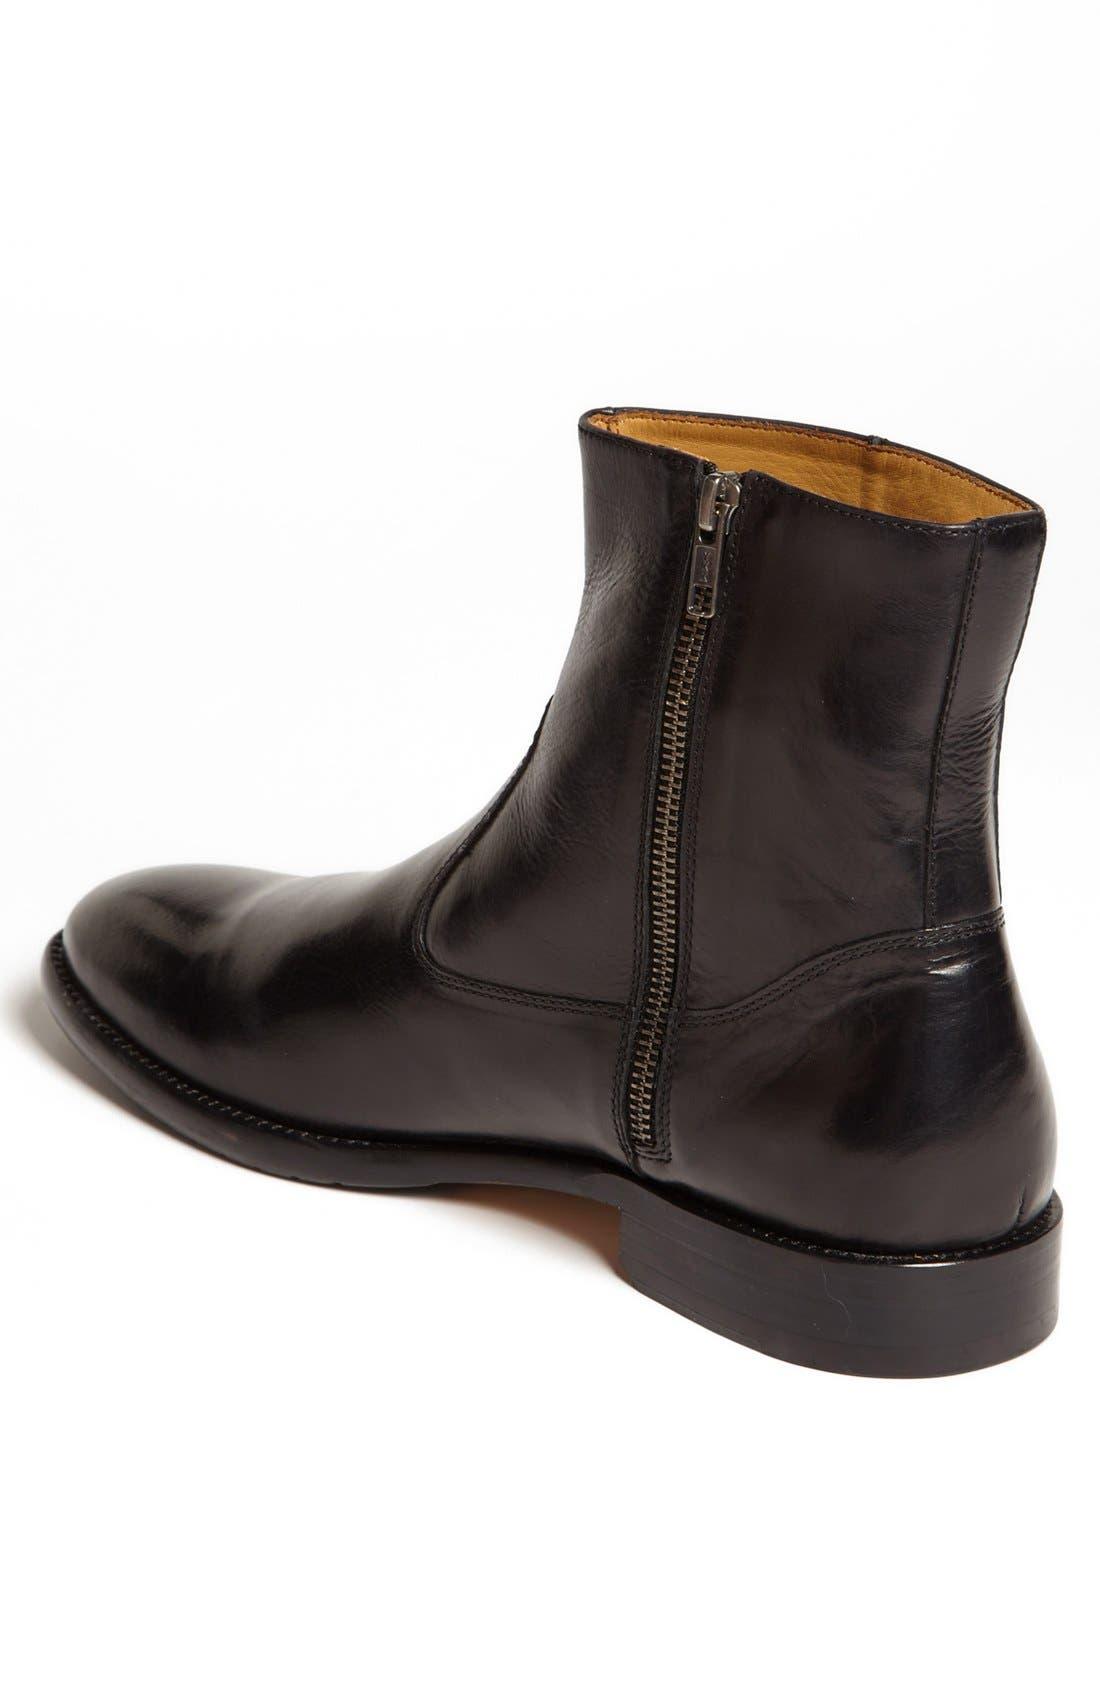 Alternate Image 2  - Gordon Rush 'Stanton' Zip Boot